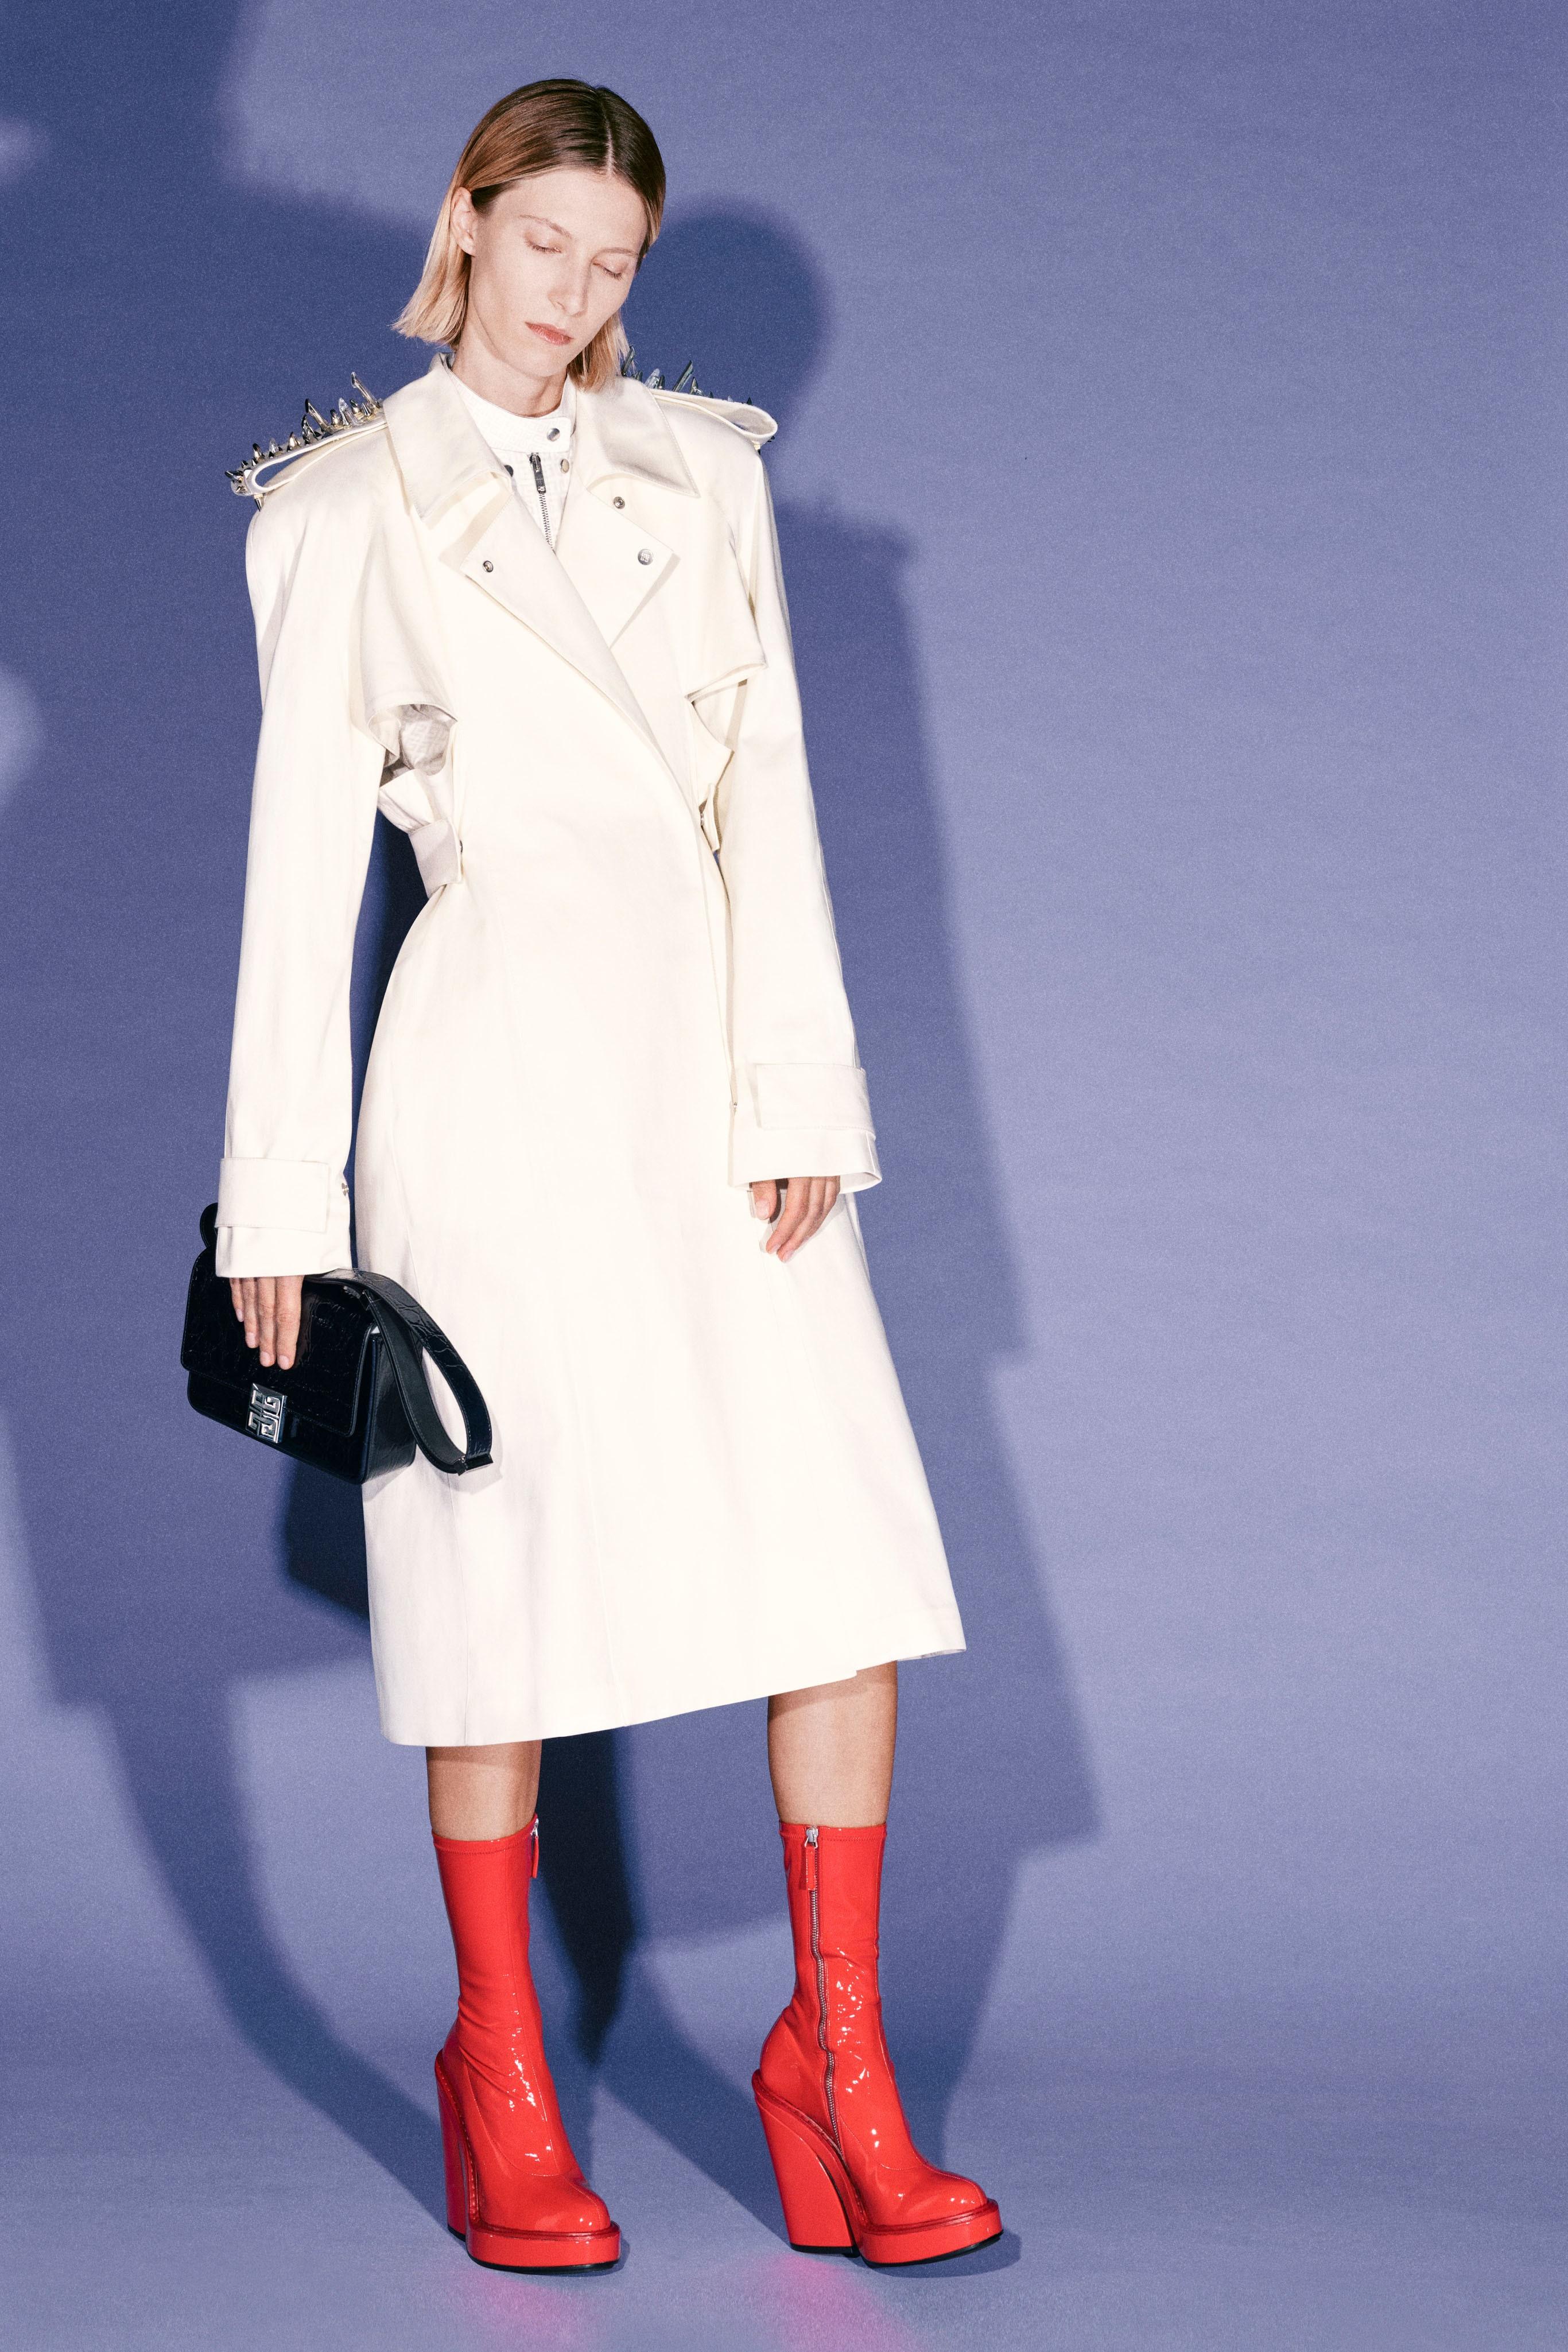 00009-Givenchy-Pre-Fall-21